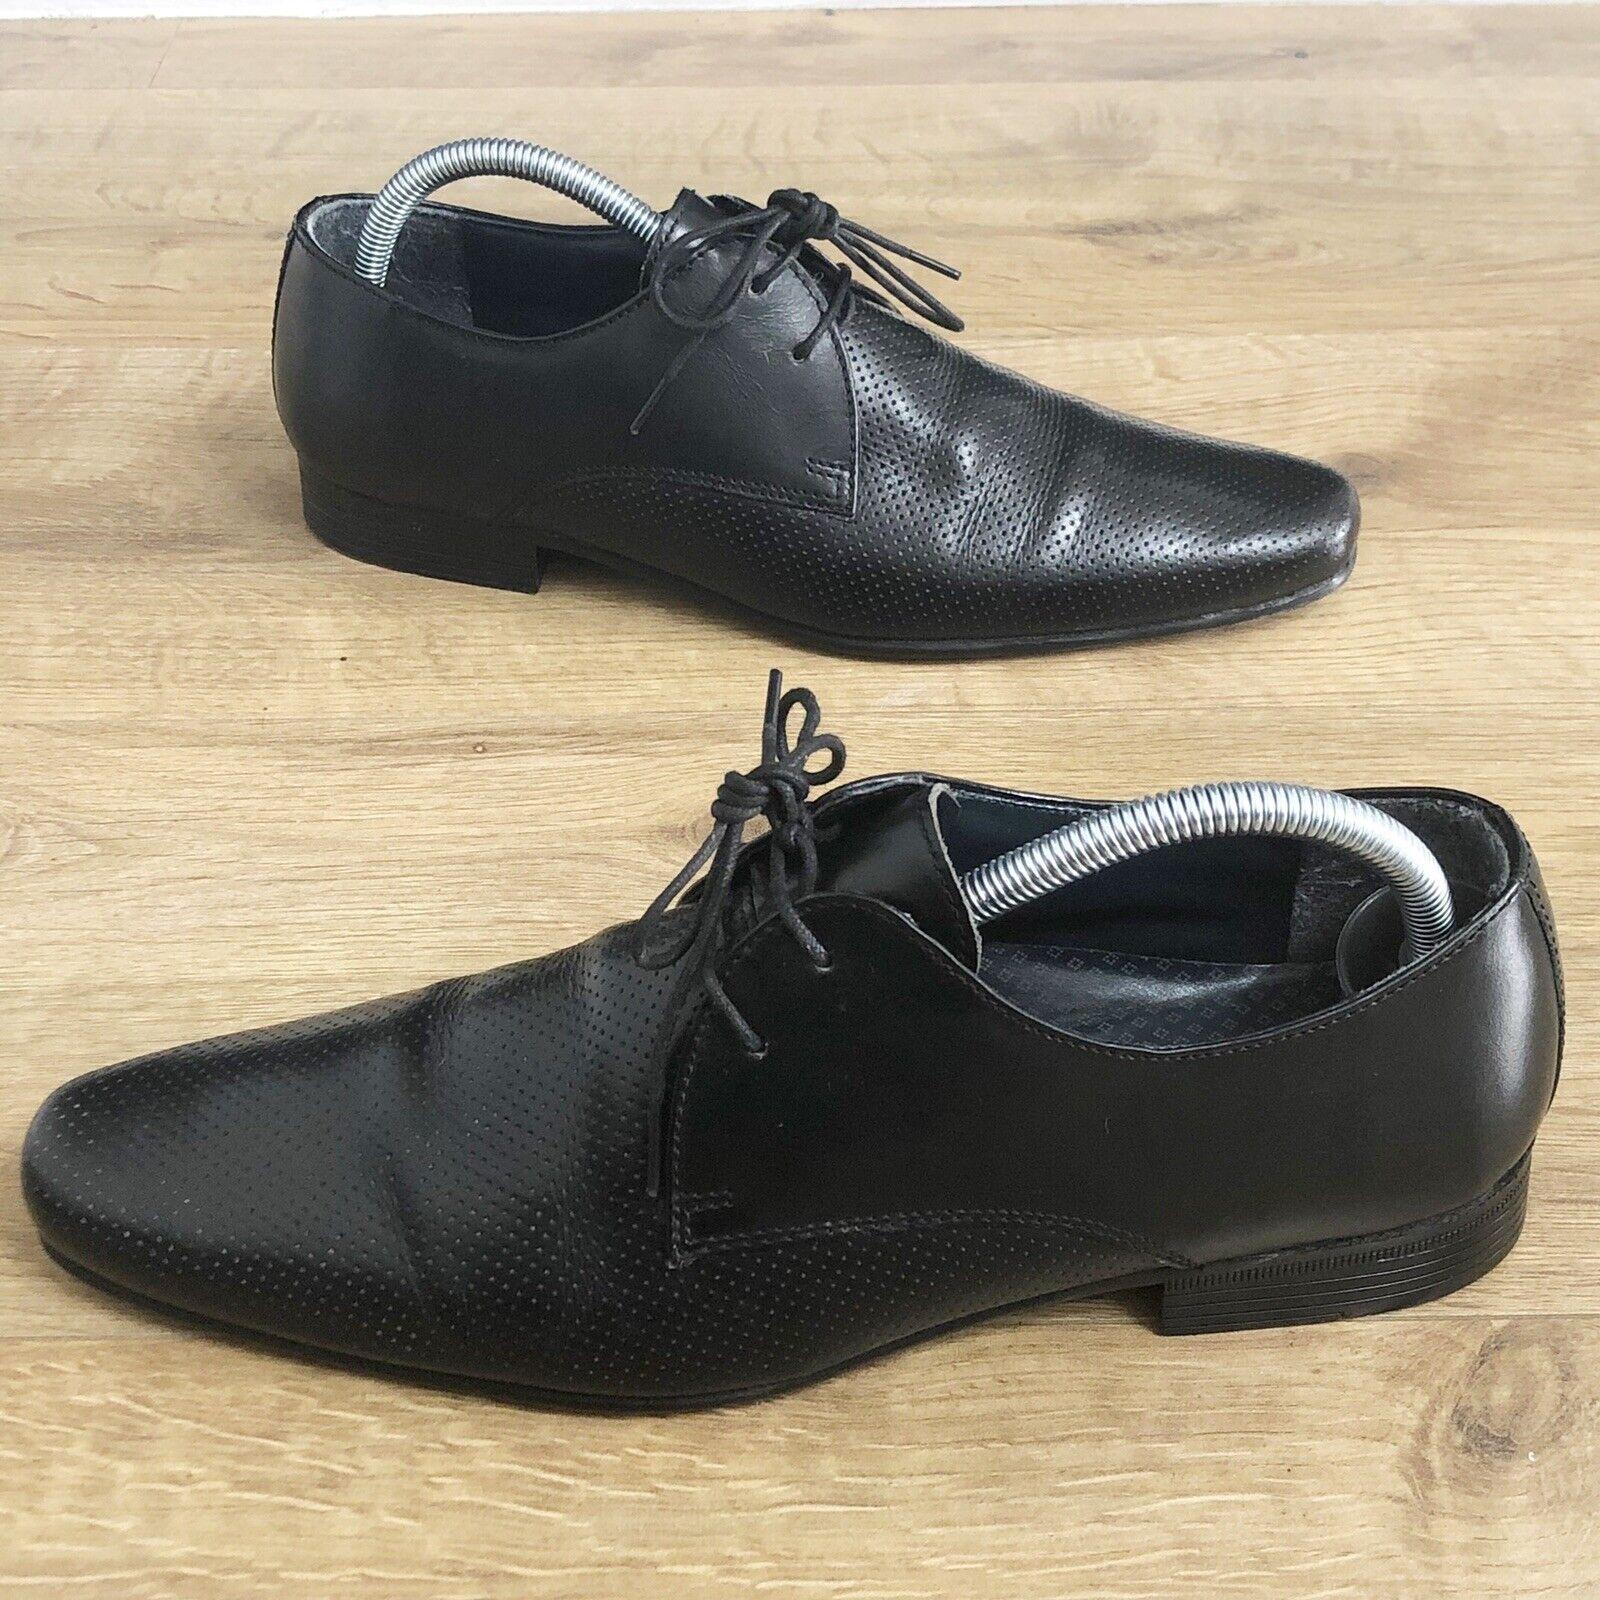 Next Black Leather Pointed Toe Lace Up Shoes Size UK 6.5 (eur40) Men's